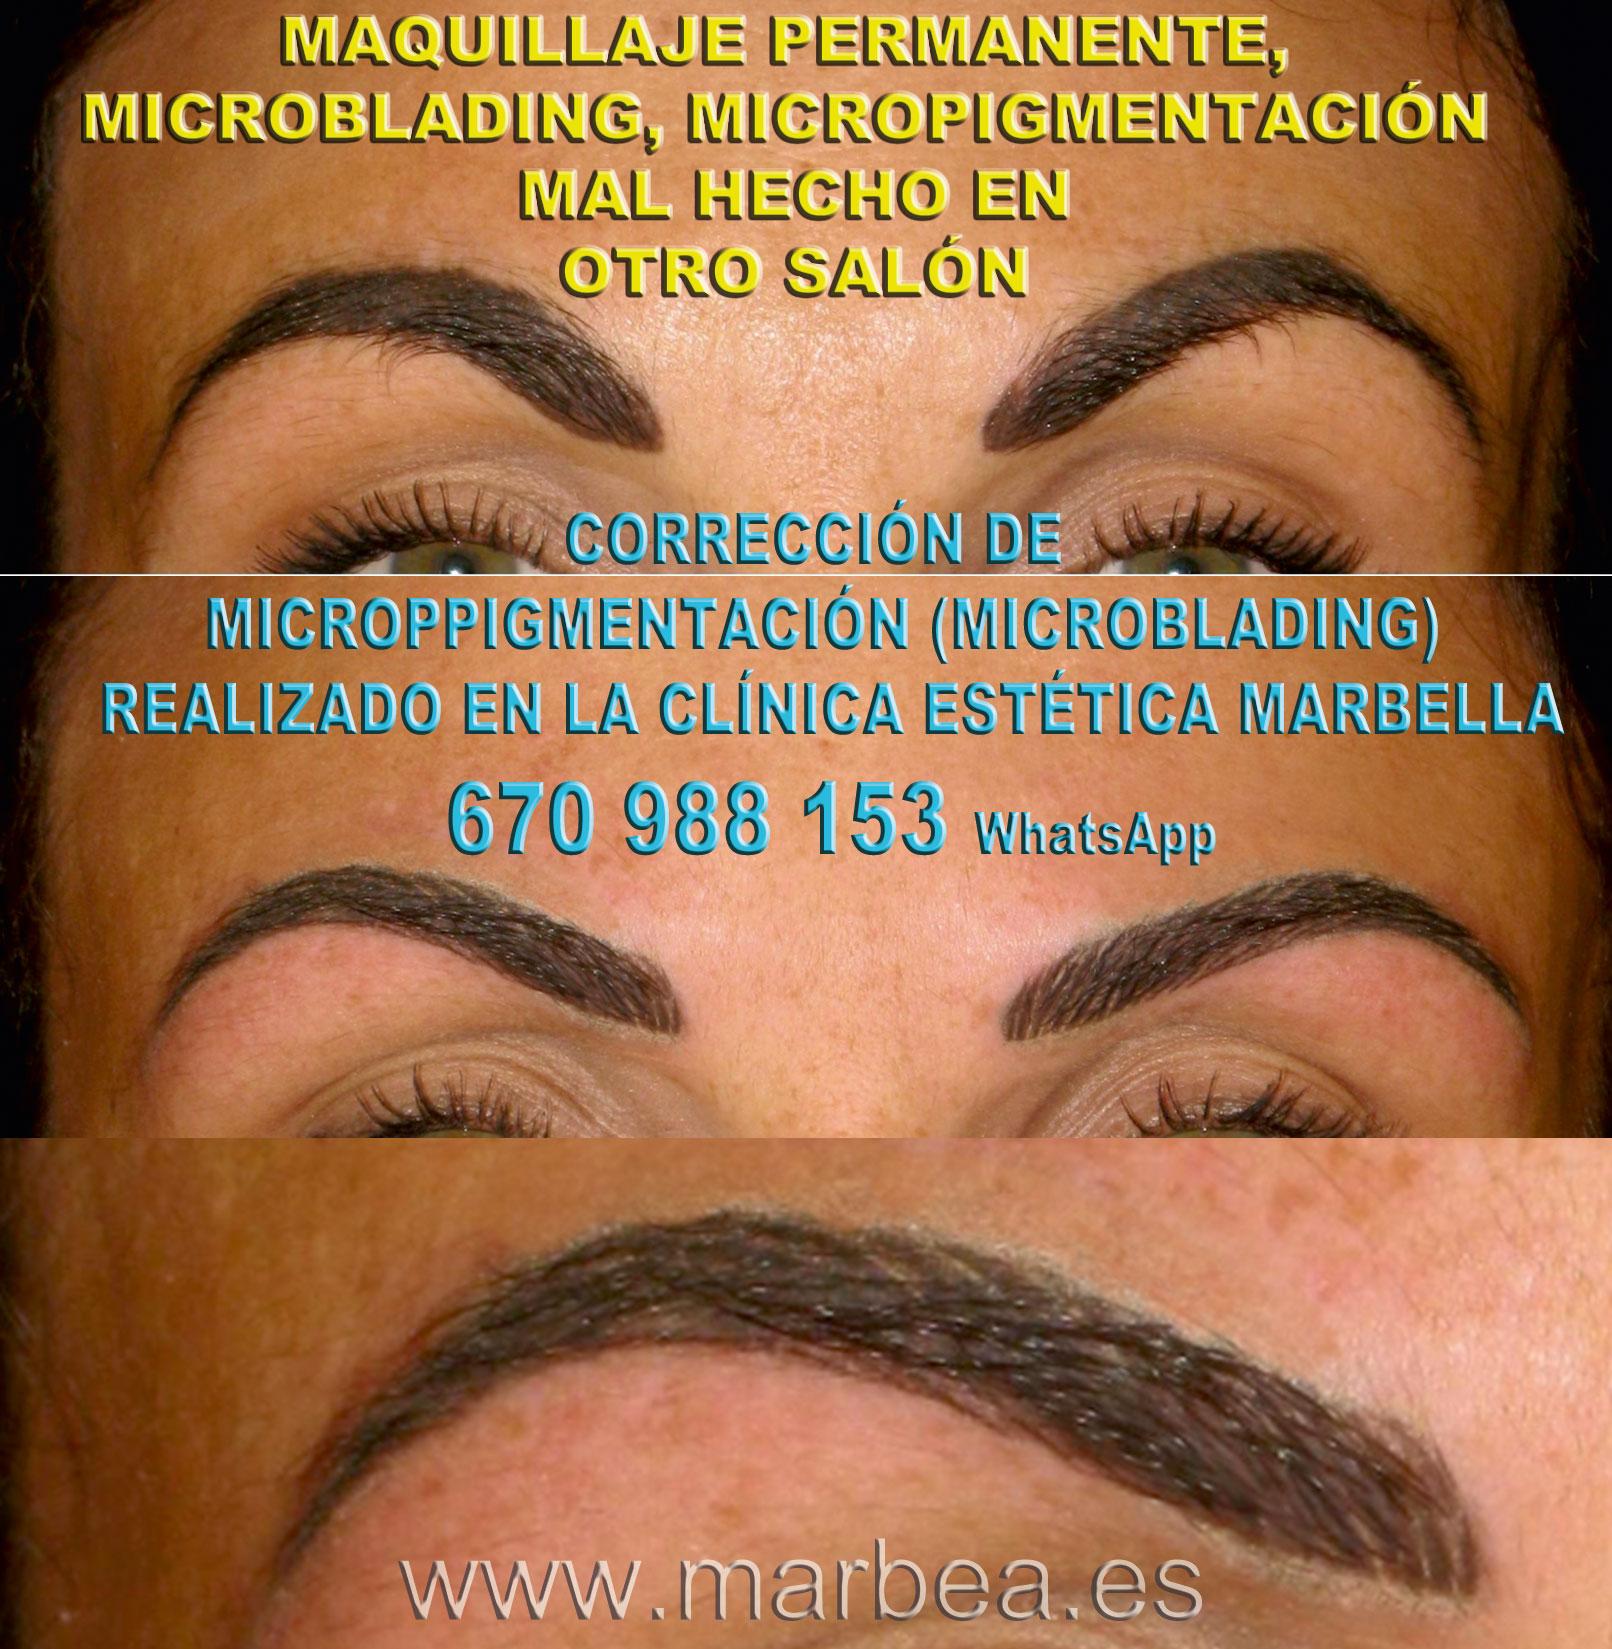 Borrar maquillaje permanente mal hecha clínica estética micropigmentación propone micropigmentacion correctiva de cejas,corregir micropigmentación no deseada